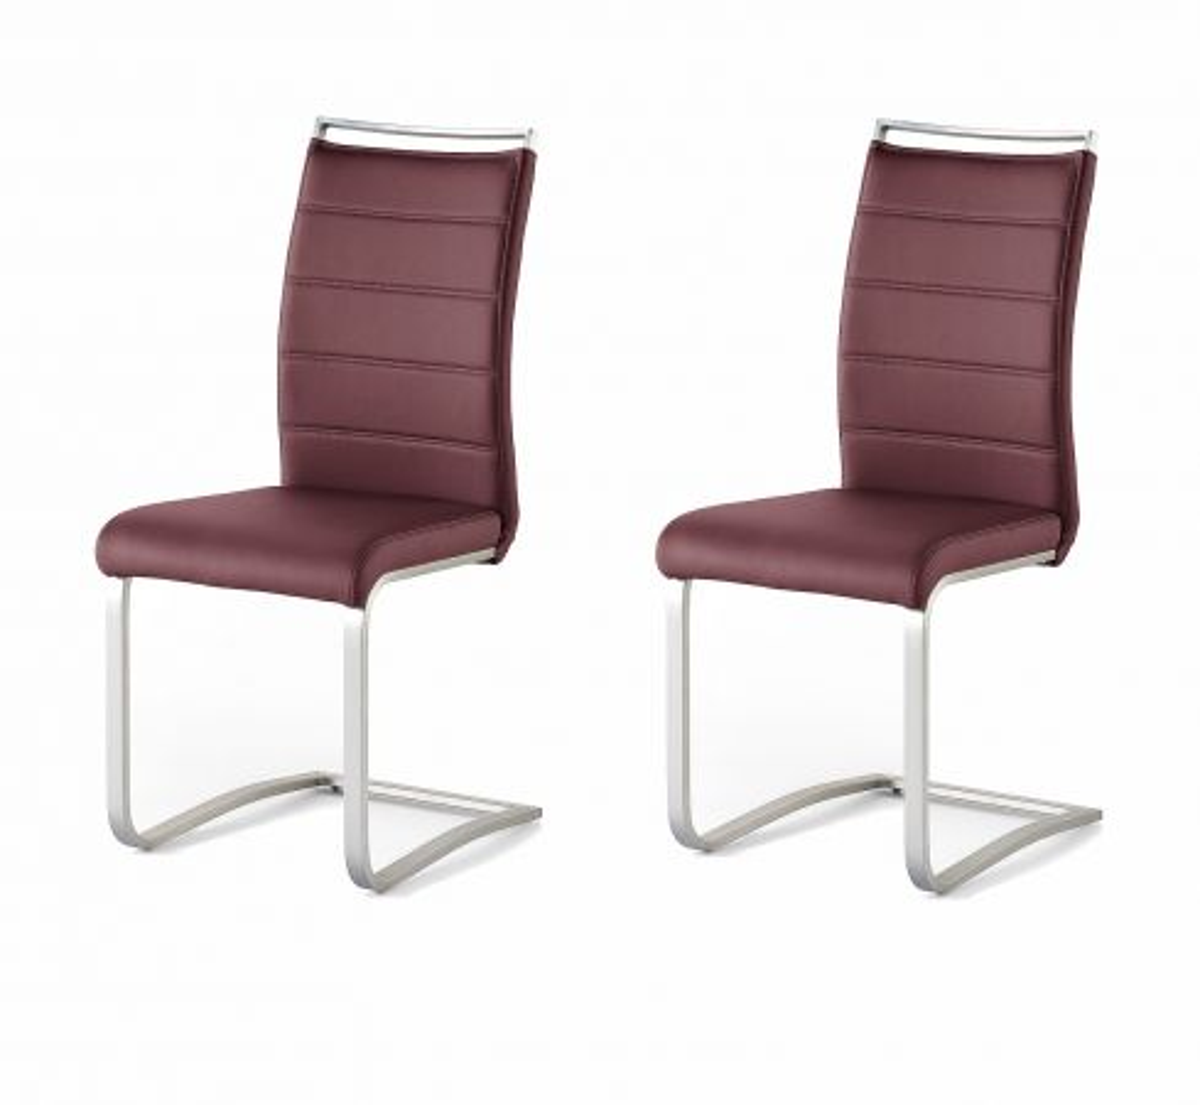 2 x Stuhl Pescara Bordeaux Schwinger Kunstleder